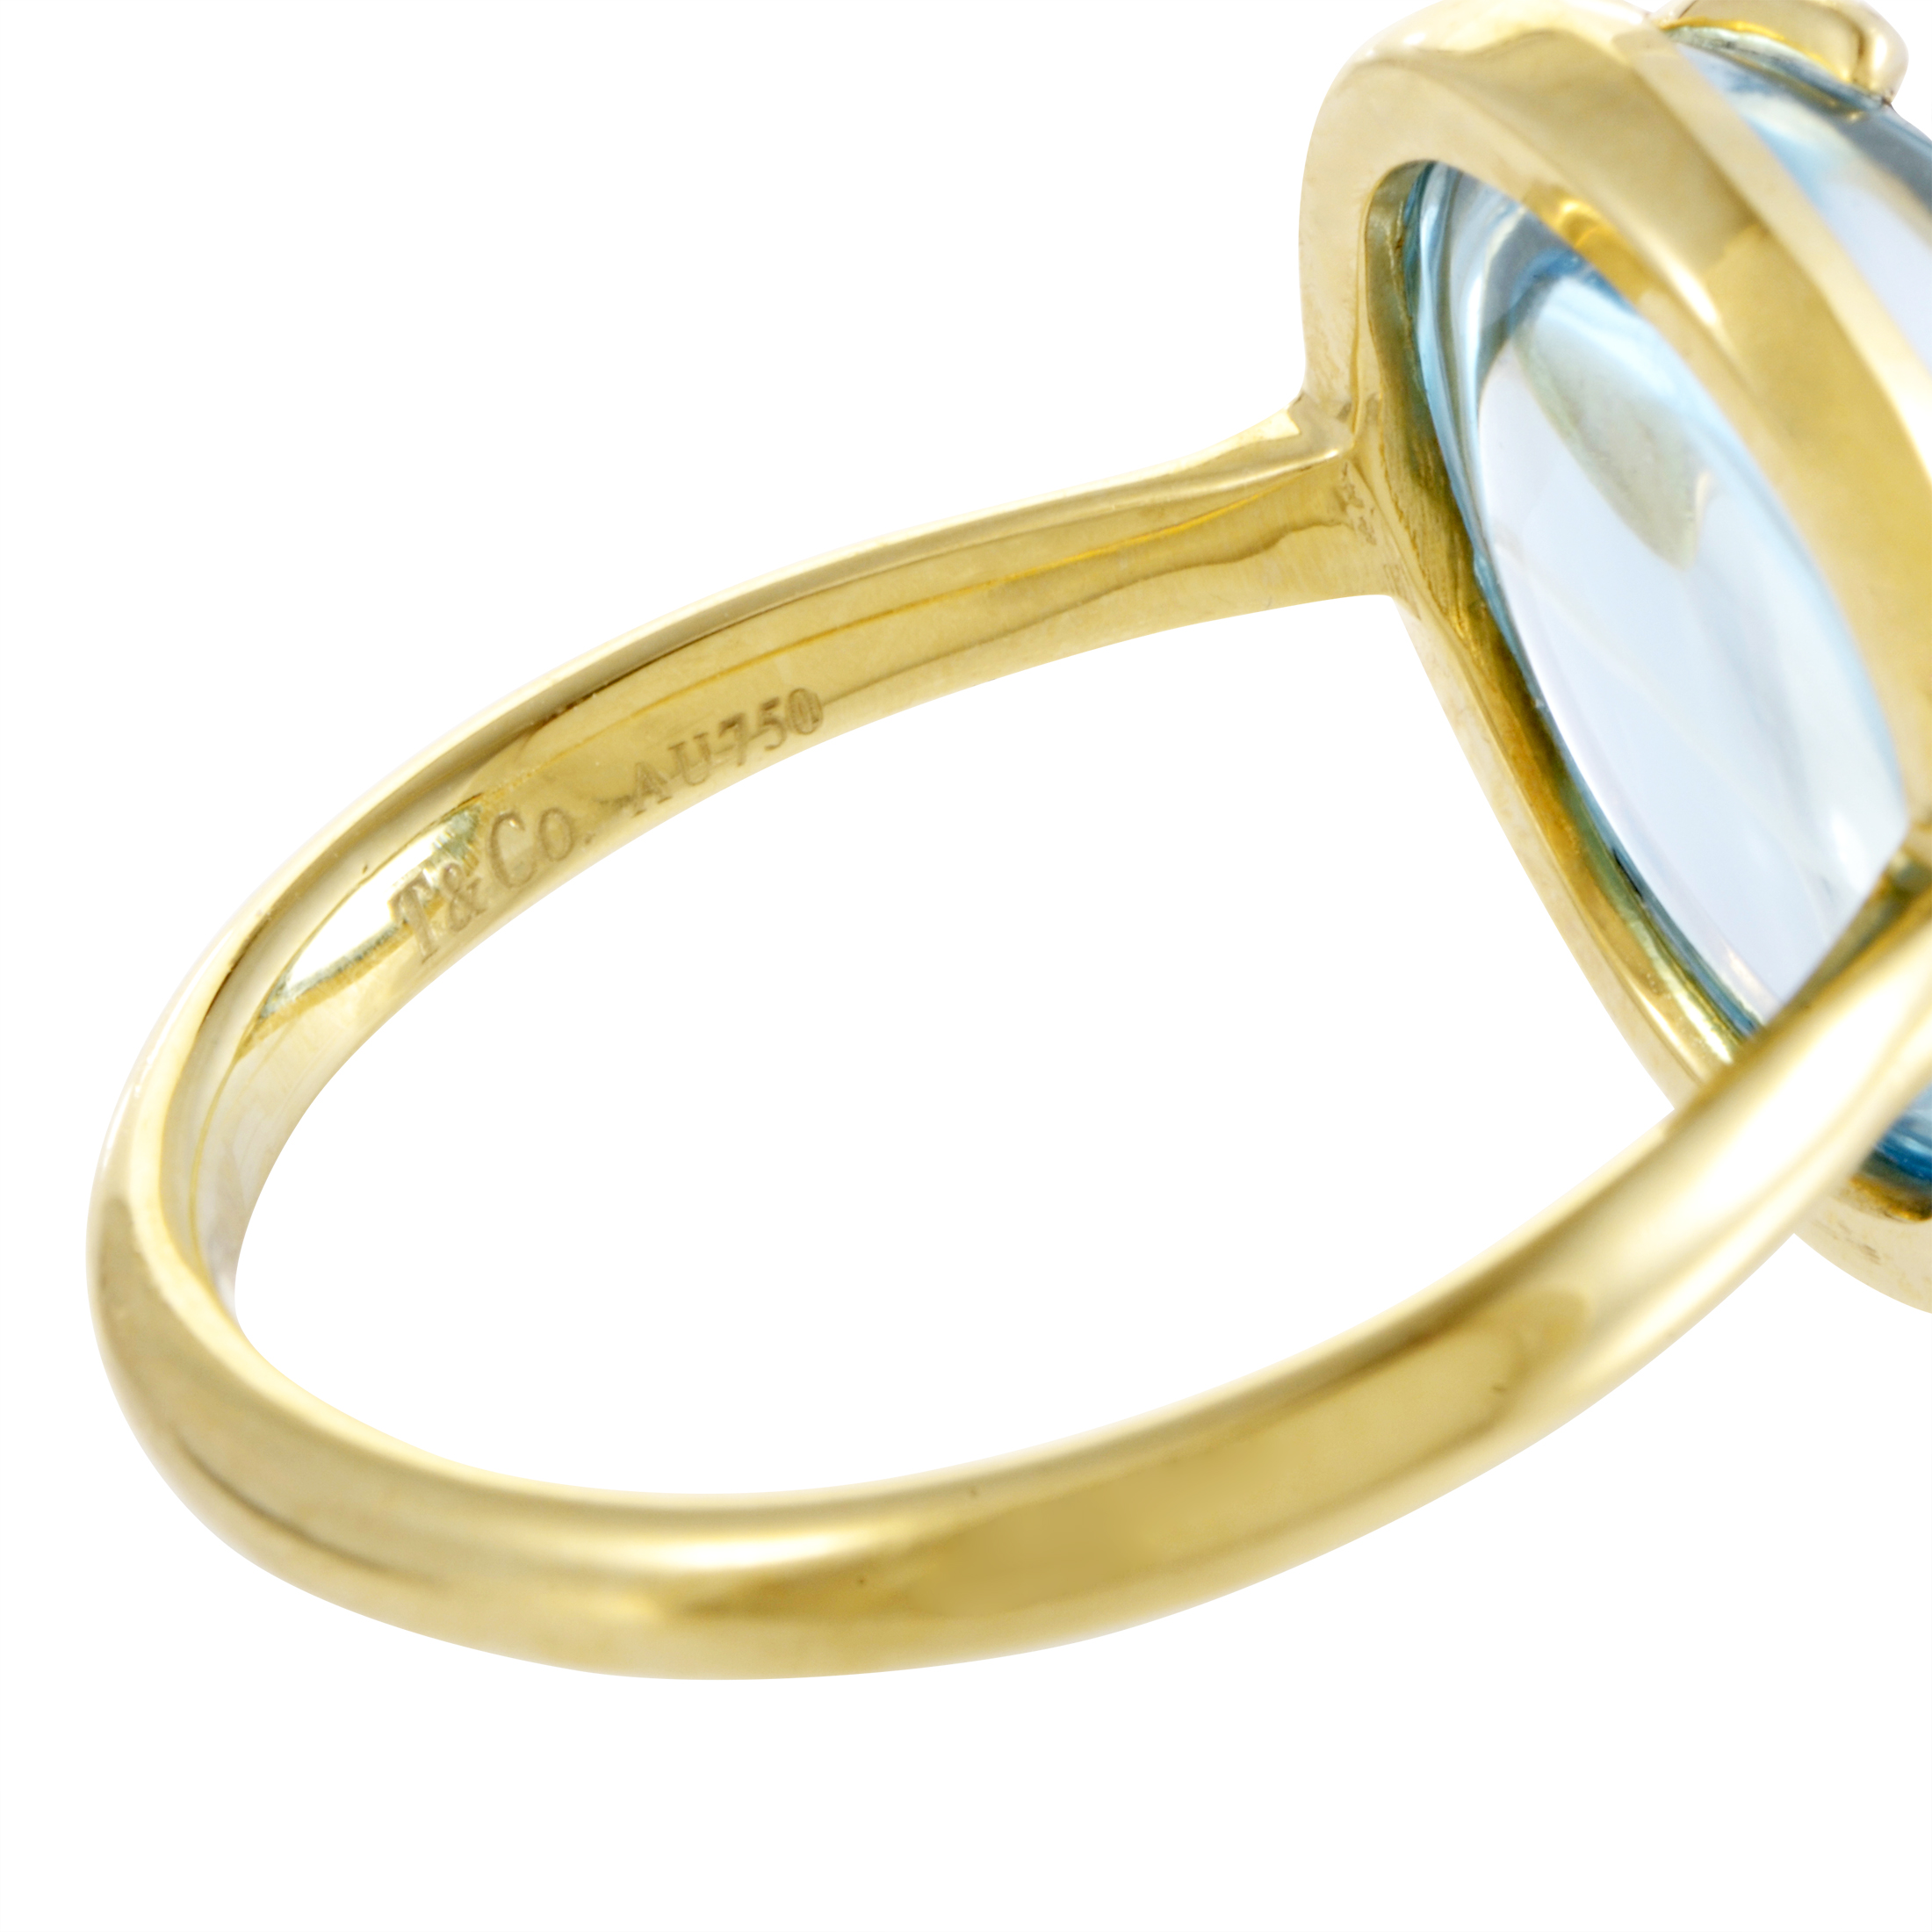 Tiffany Amp Co Paloma Picasso 18k Yellow Gold Topaz Olive